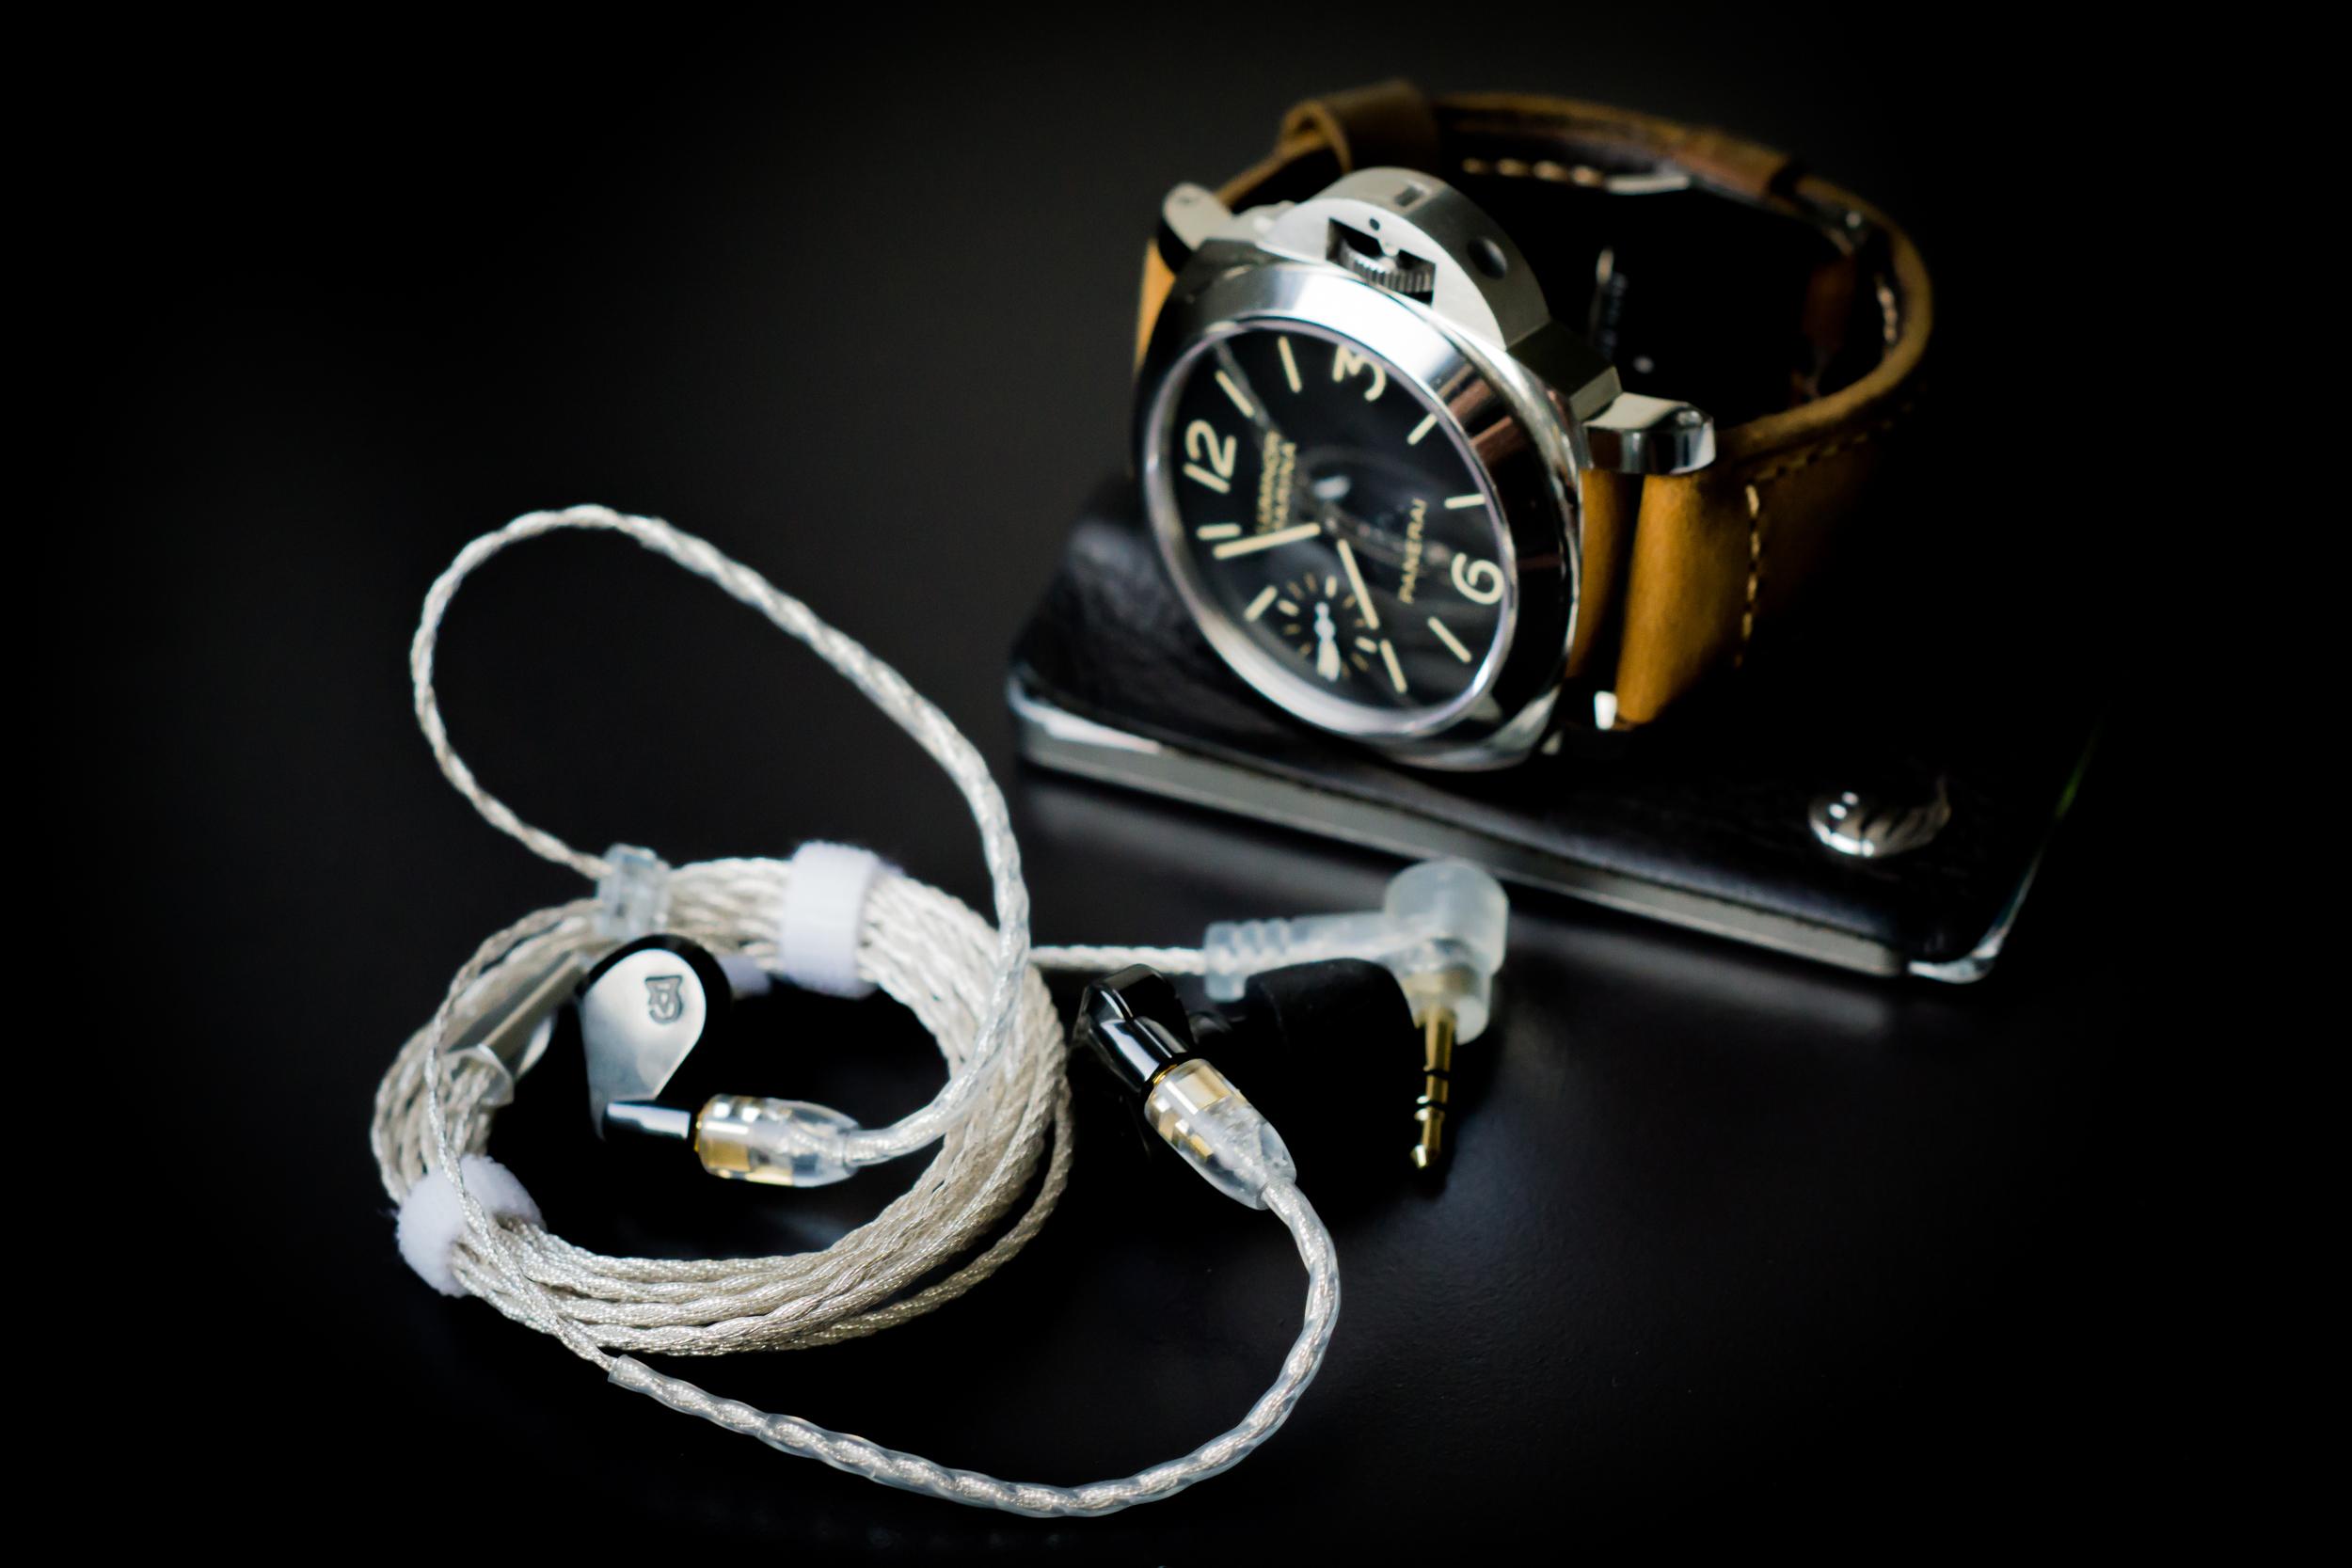 Campfire Audio Lyra + Flux wallet + Panerai watch... the perfect audiophile EDC.